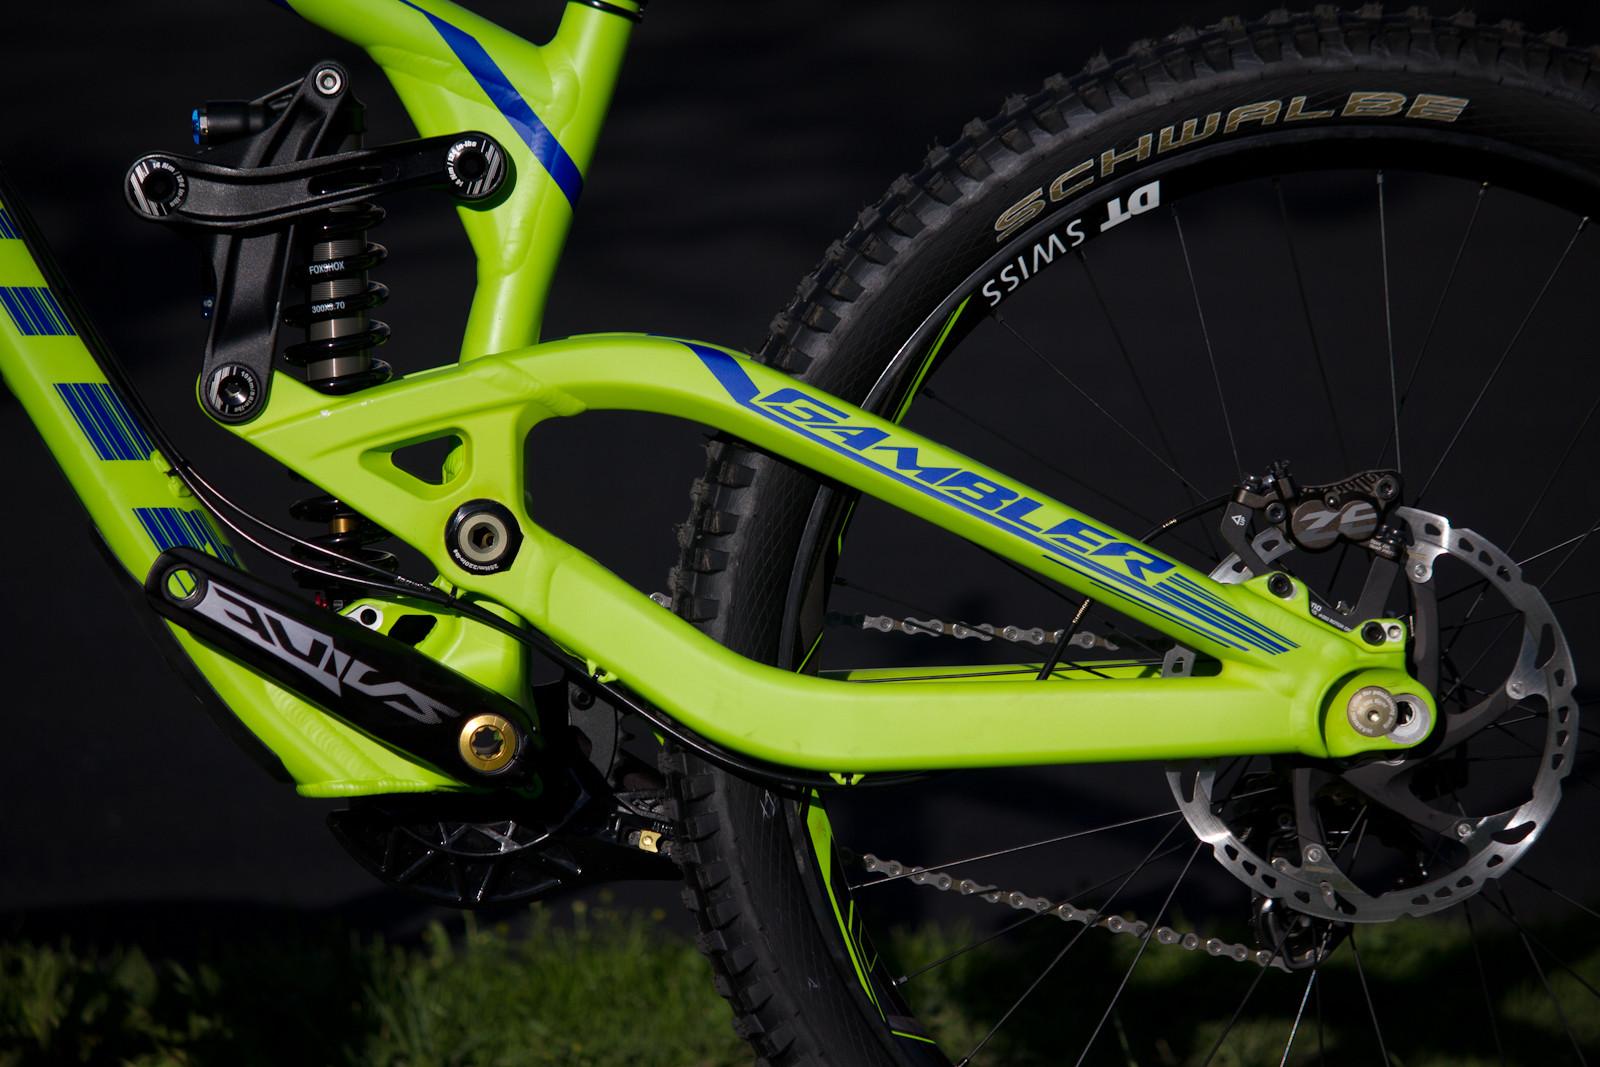 2013 Scott Gambler 10 - Rear Triangle - First Look: 2013 Scott Gambler 10 - Ready For Production - Mountain Biking Pictures - Vital MTB